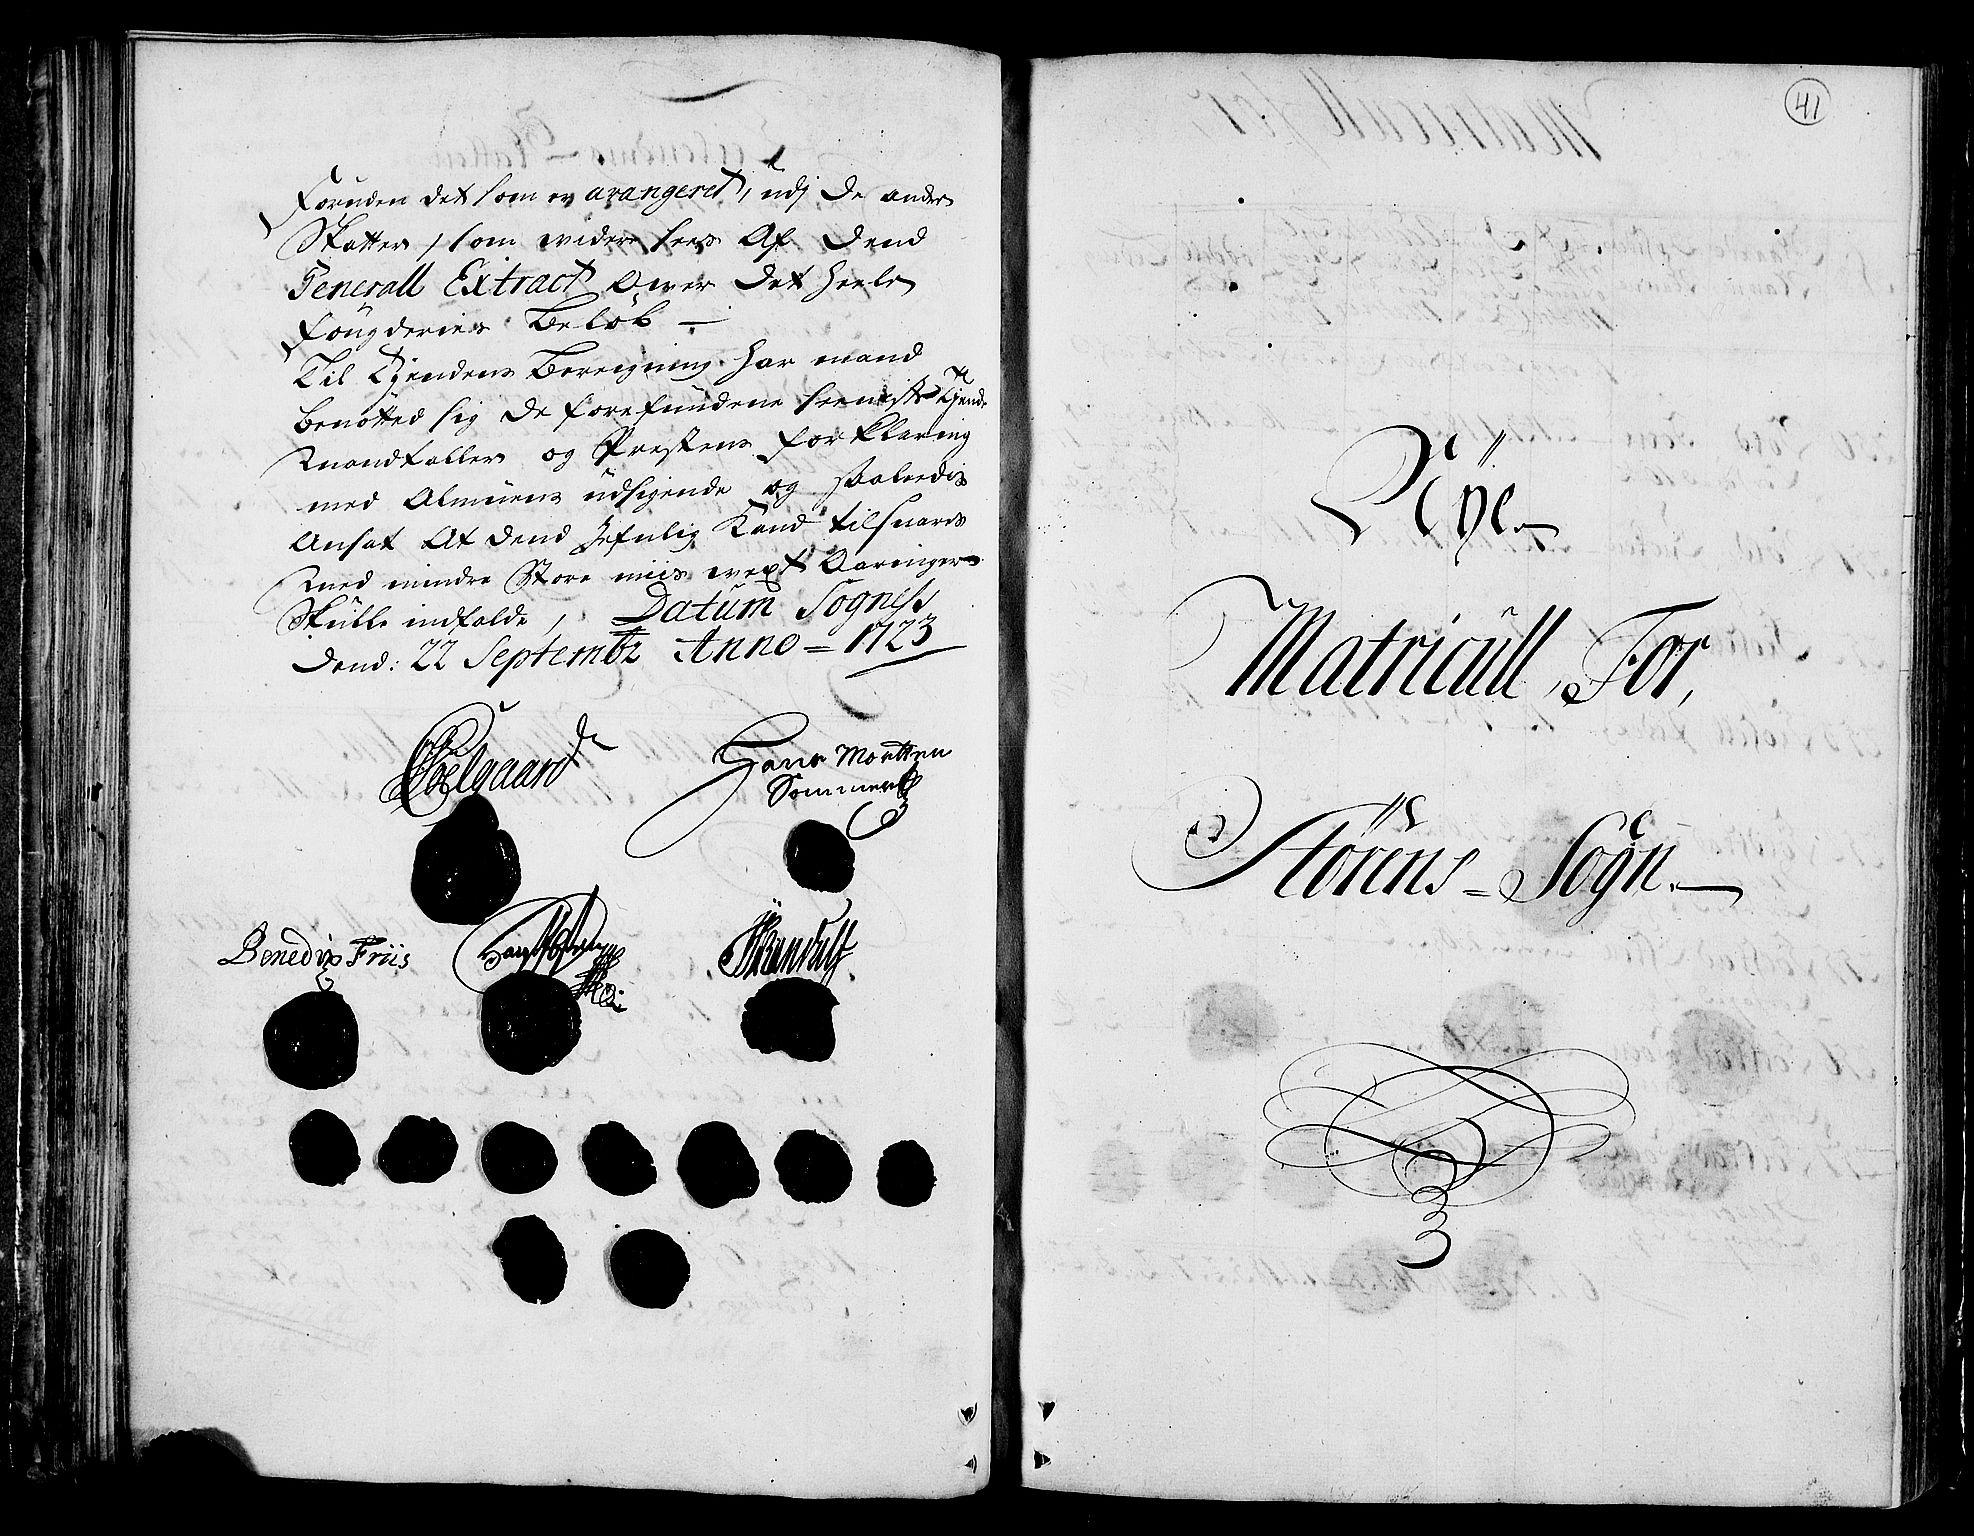 RA, Rentekammeret inntil 1814, Realistisk ordnet avdeling, N/Nb/Nbf/L0159: Gauldal matrikkelprotokoll, 1723, s. 40b-41a